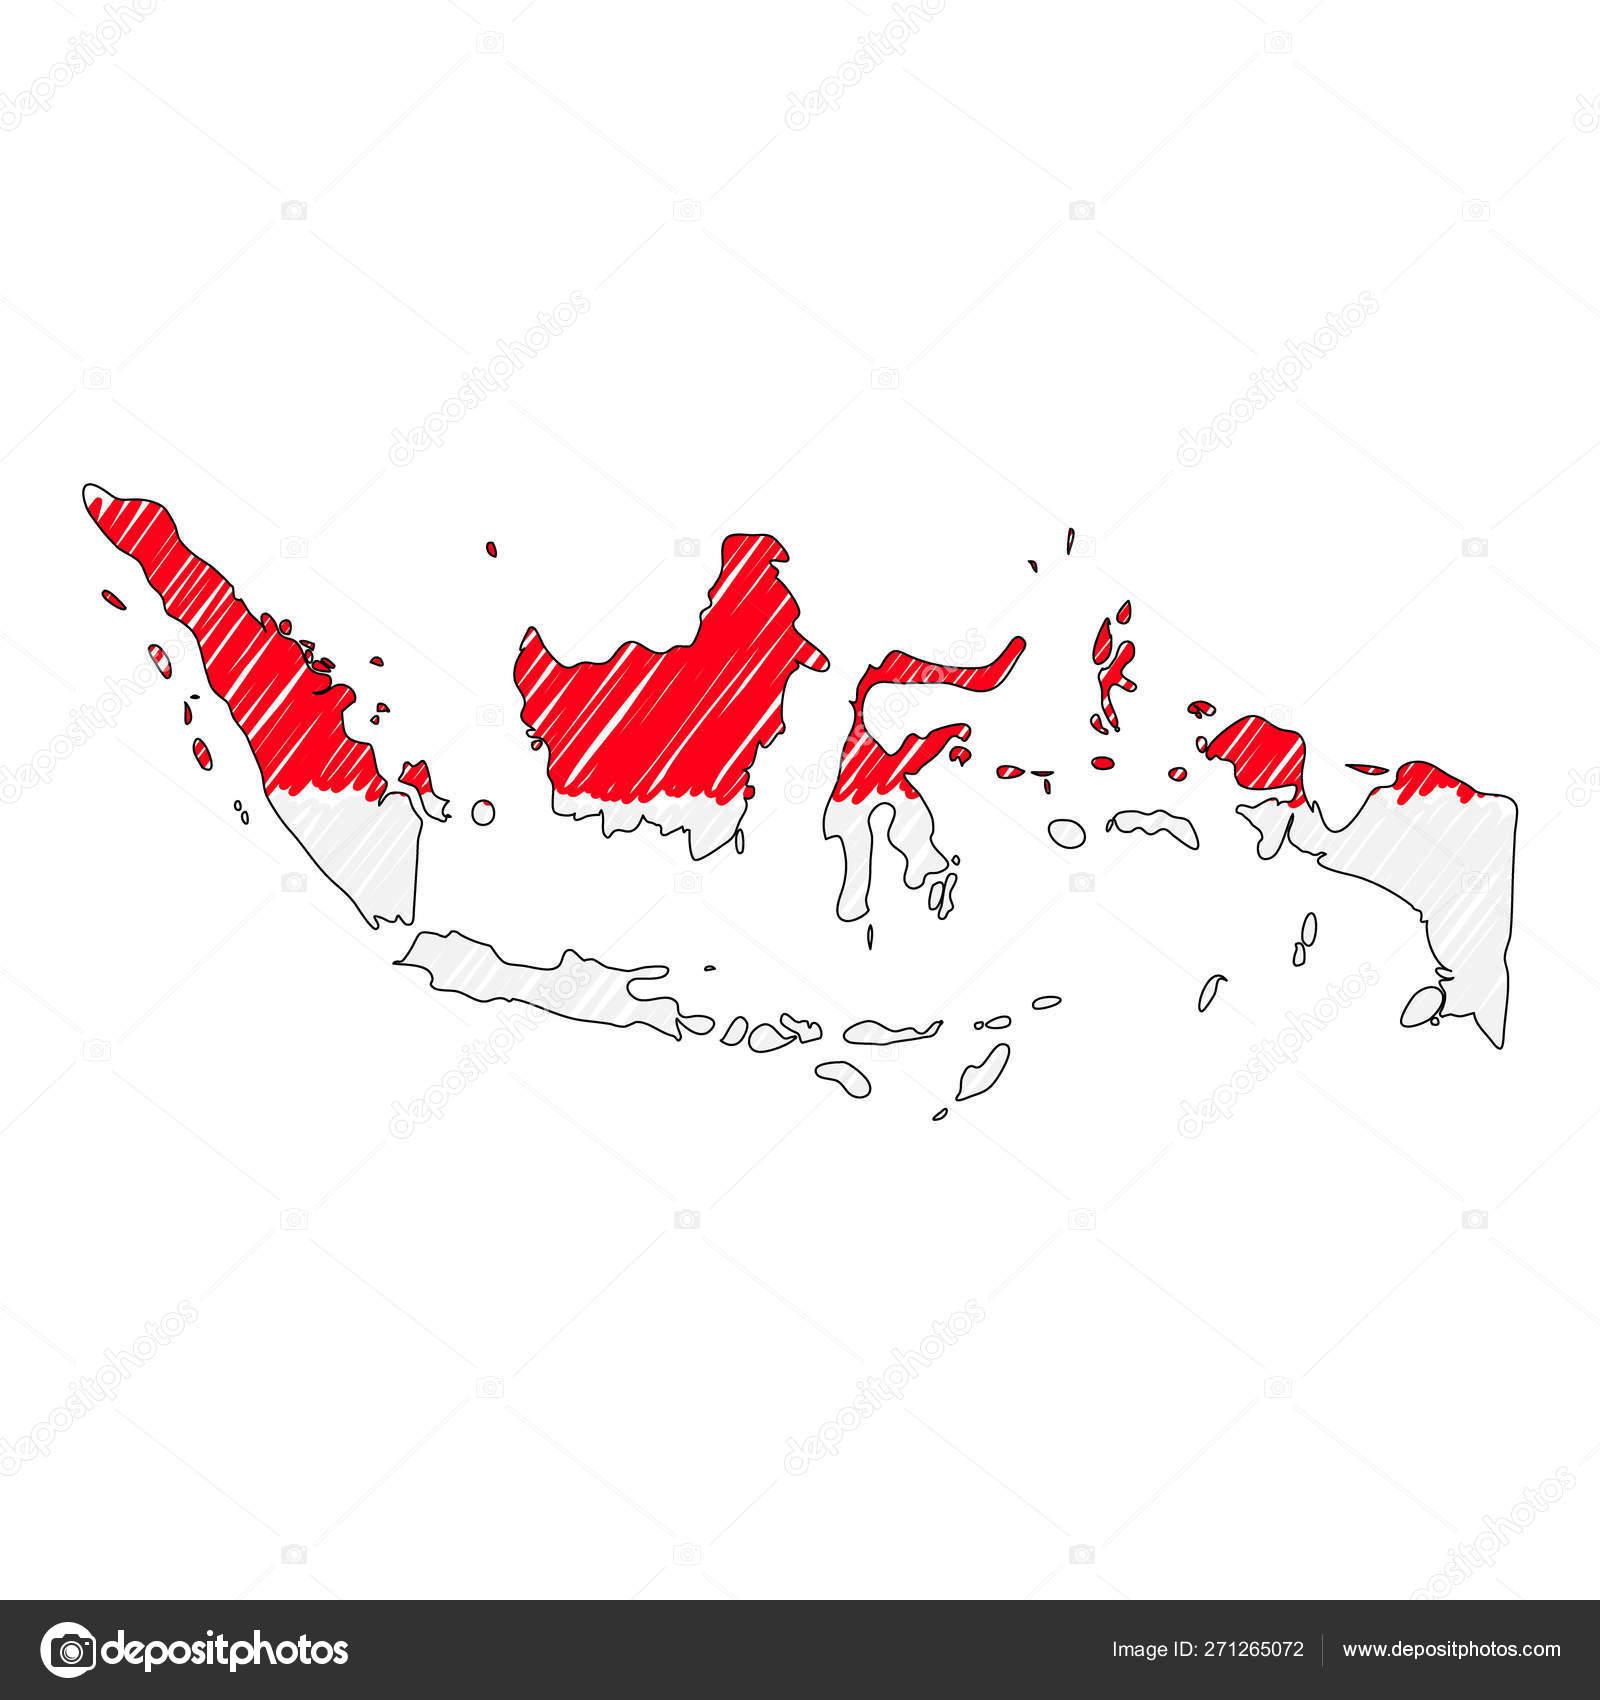 10 contoh gambar peta indonesia yang mudah digambar dapatkan pelbagai variasi wallpaper untuk smartphone maupun laptop anda secara tidak dipungut bayaran tanpa ribet dan tidak perlu mendaftar apapun. Peta Gambar Tangan Indonesia Stok Vektor Ilustrasi Peta Gambar Tangan Indonesia Bebas Royalti Depositphotos